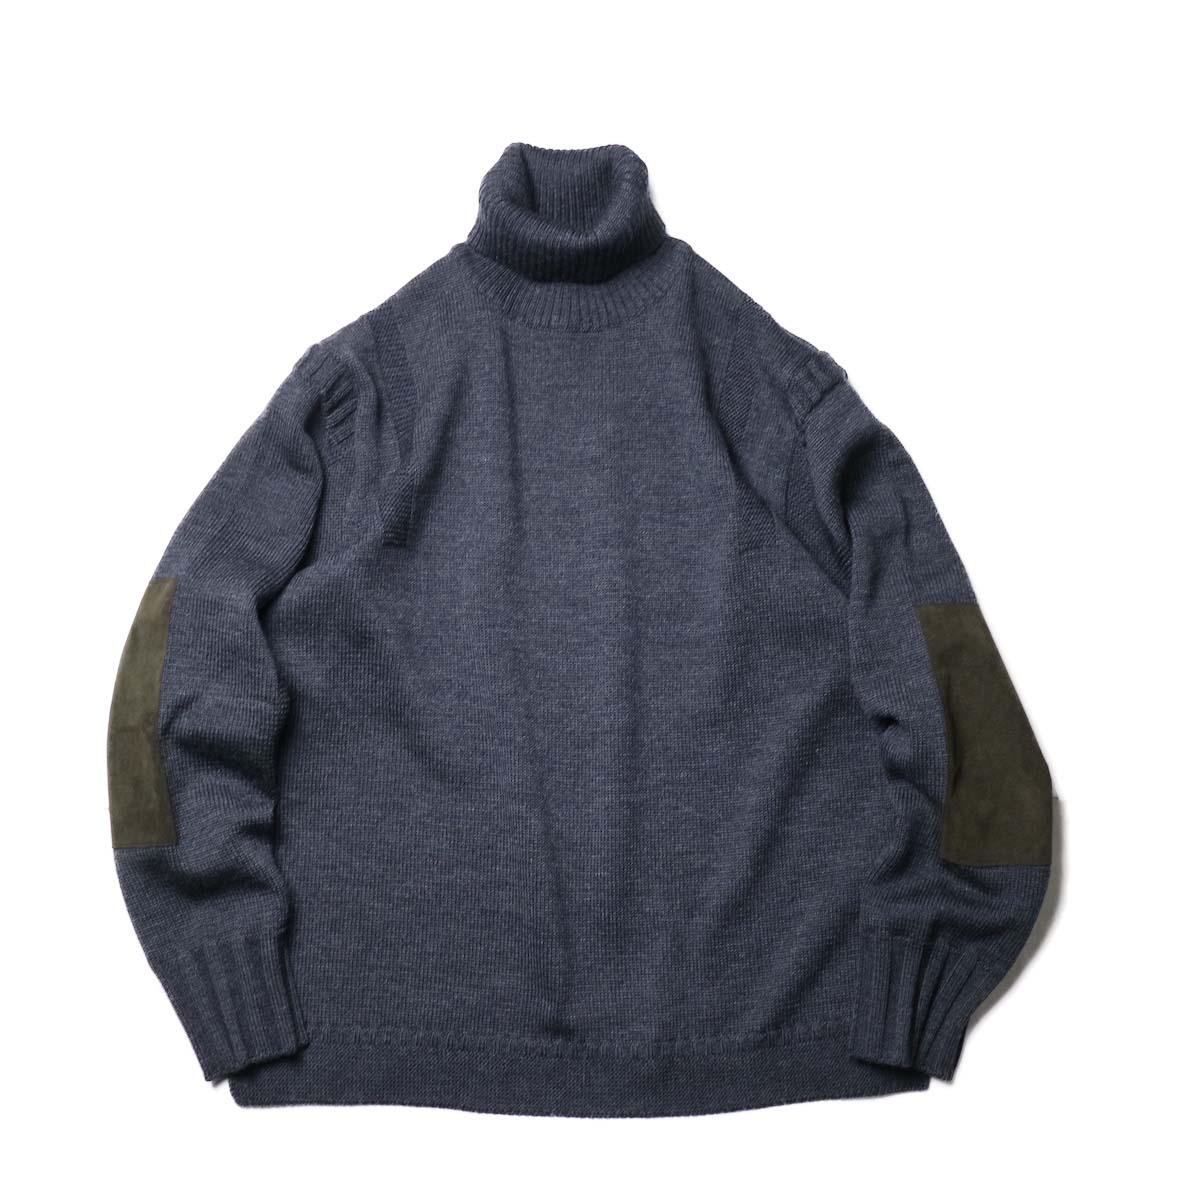 "BRENA / ""PECHEUR"" Turtle Neck Sweater (Chacoal)"